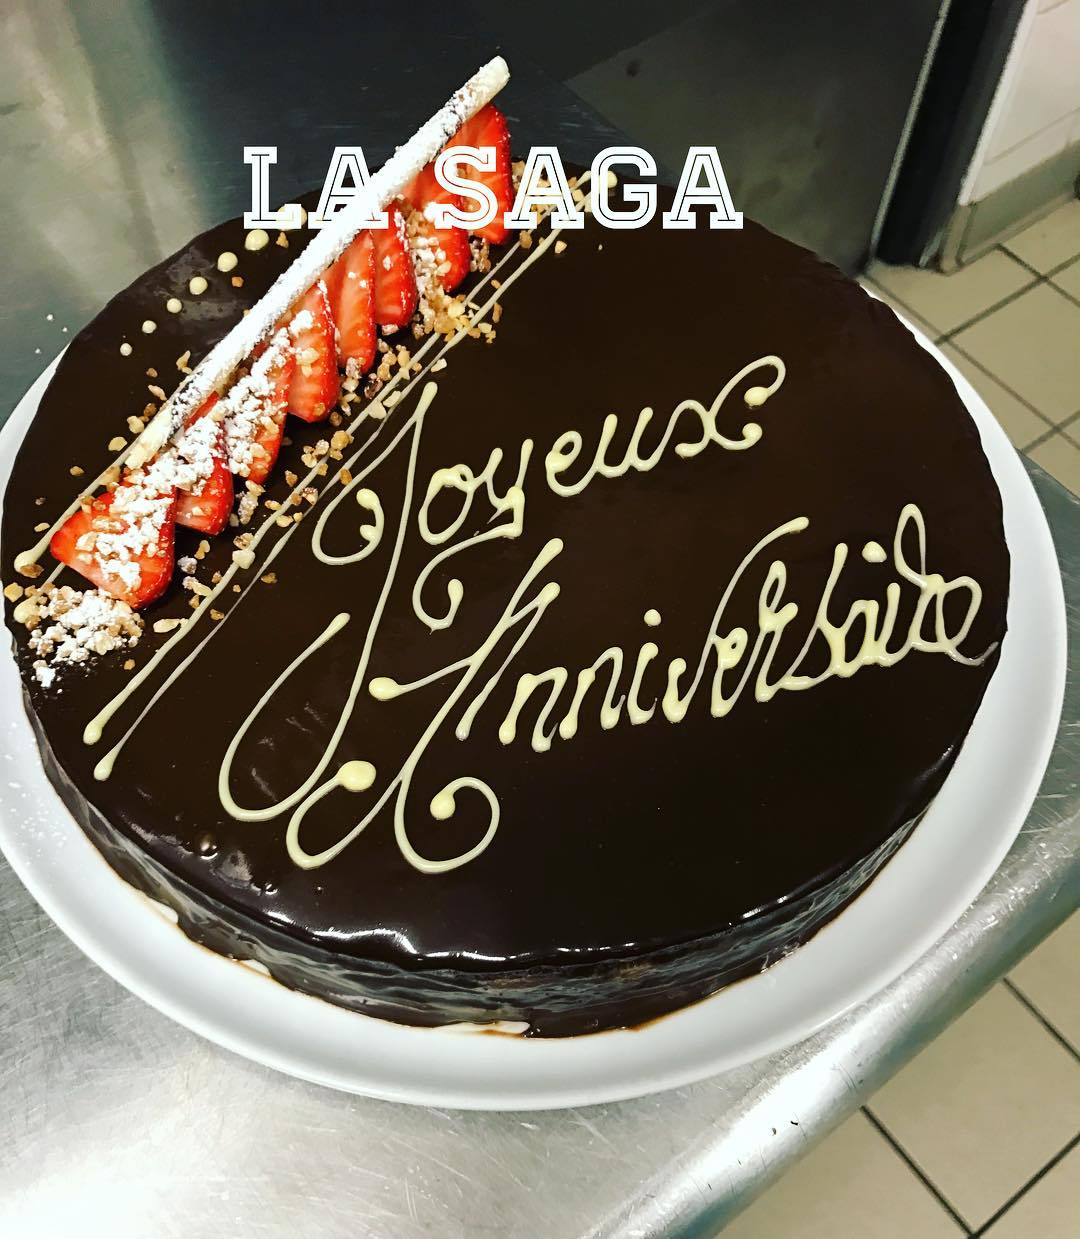 gateau-anniversaire-restaurant-pizzeria-la-saga-carqueiranne